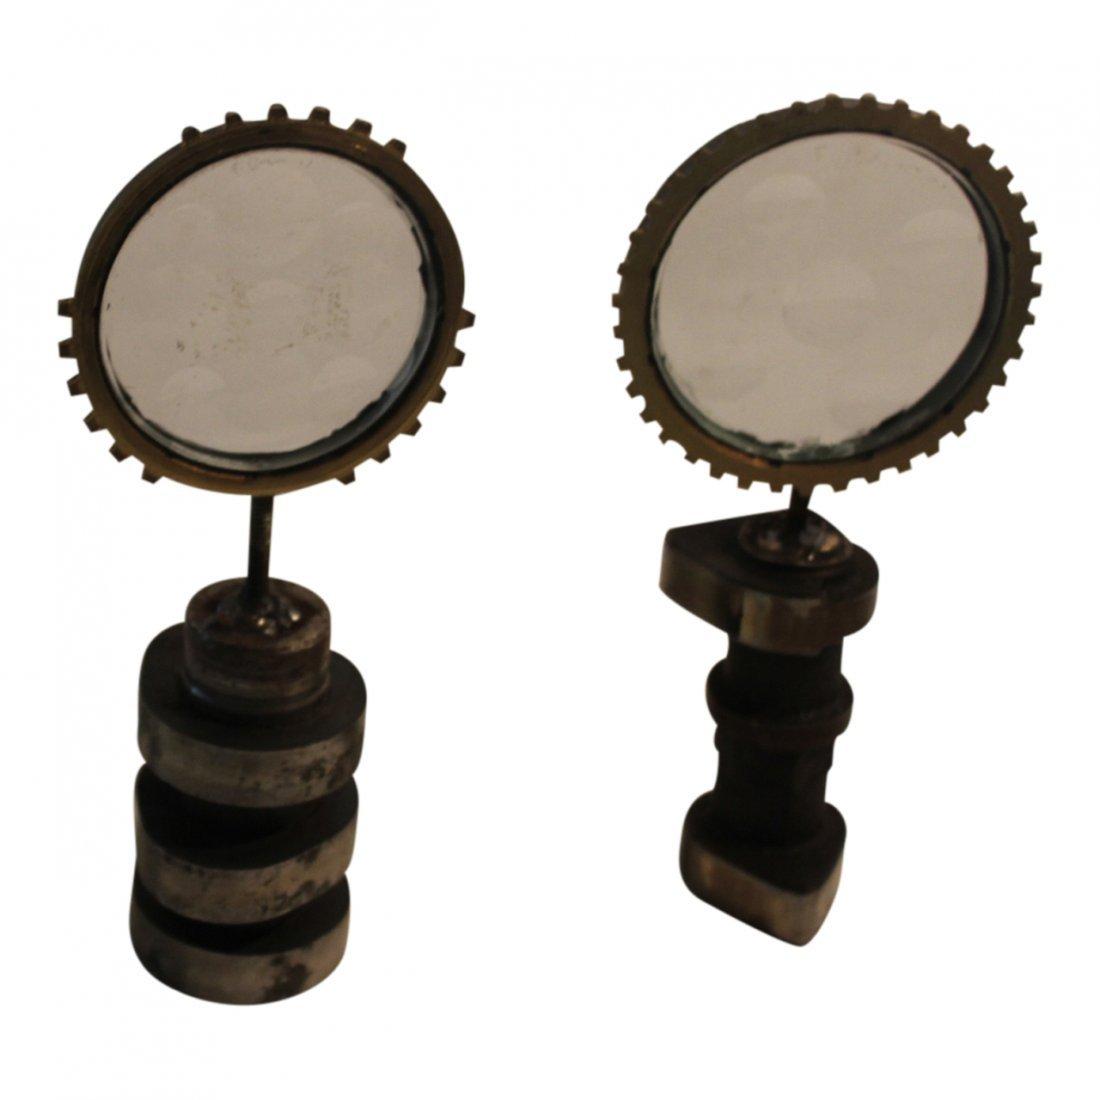 2 Feliciano Bejar Brass and Crystal Miniature Magiscope